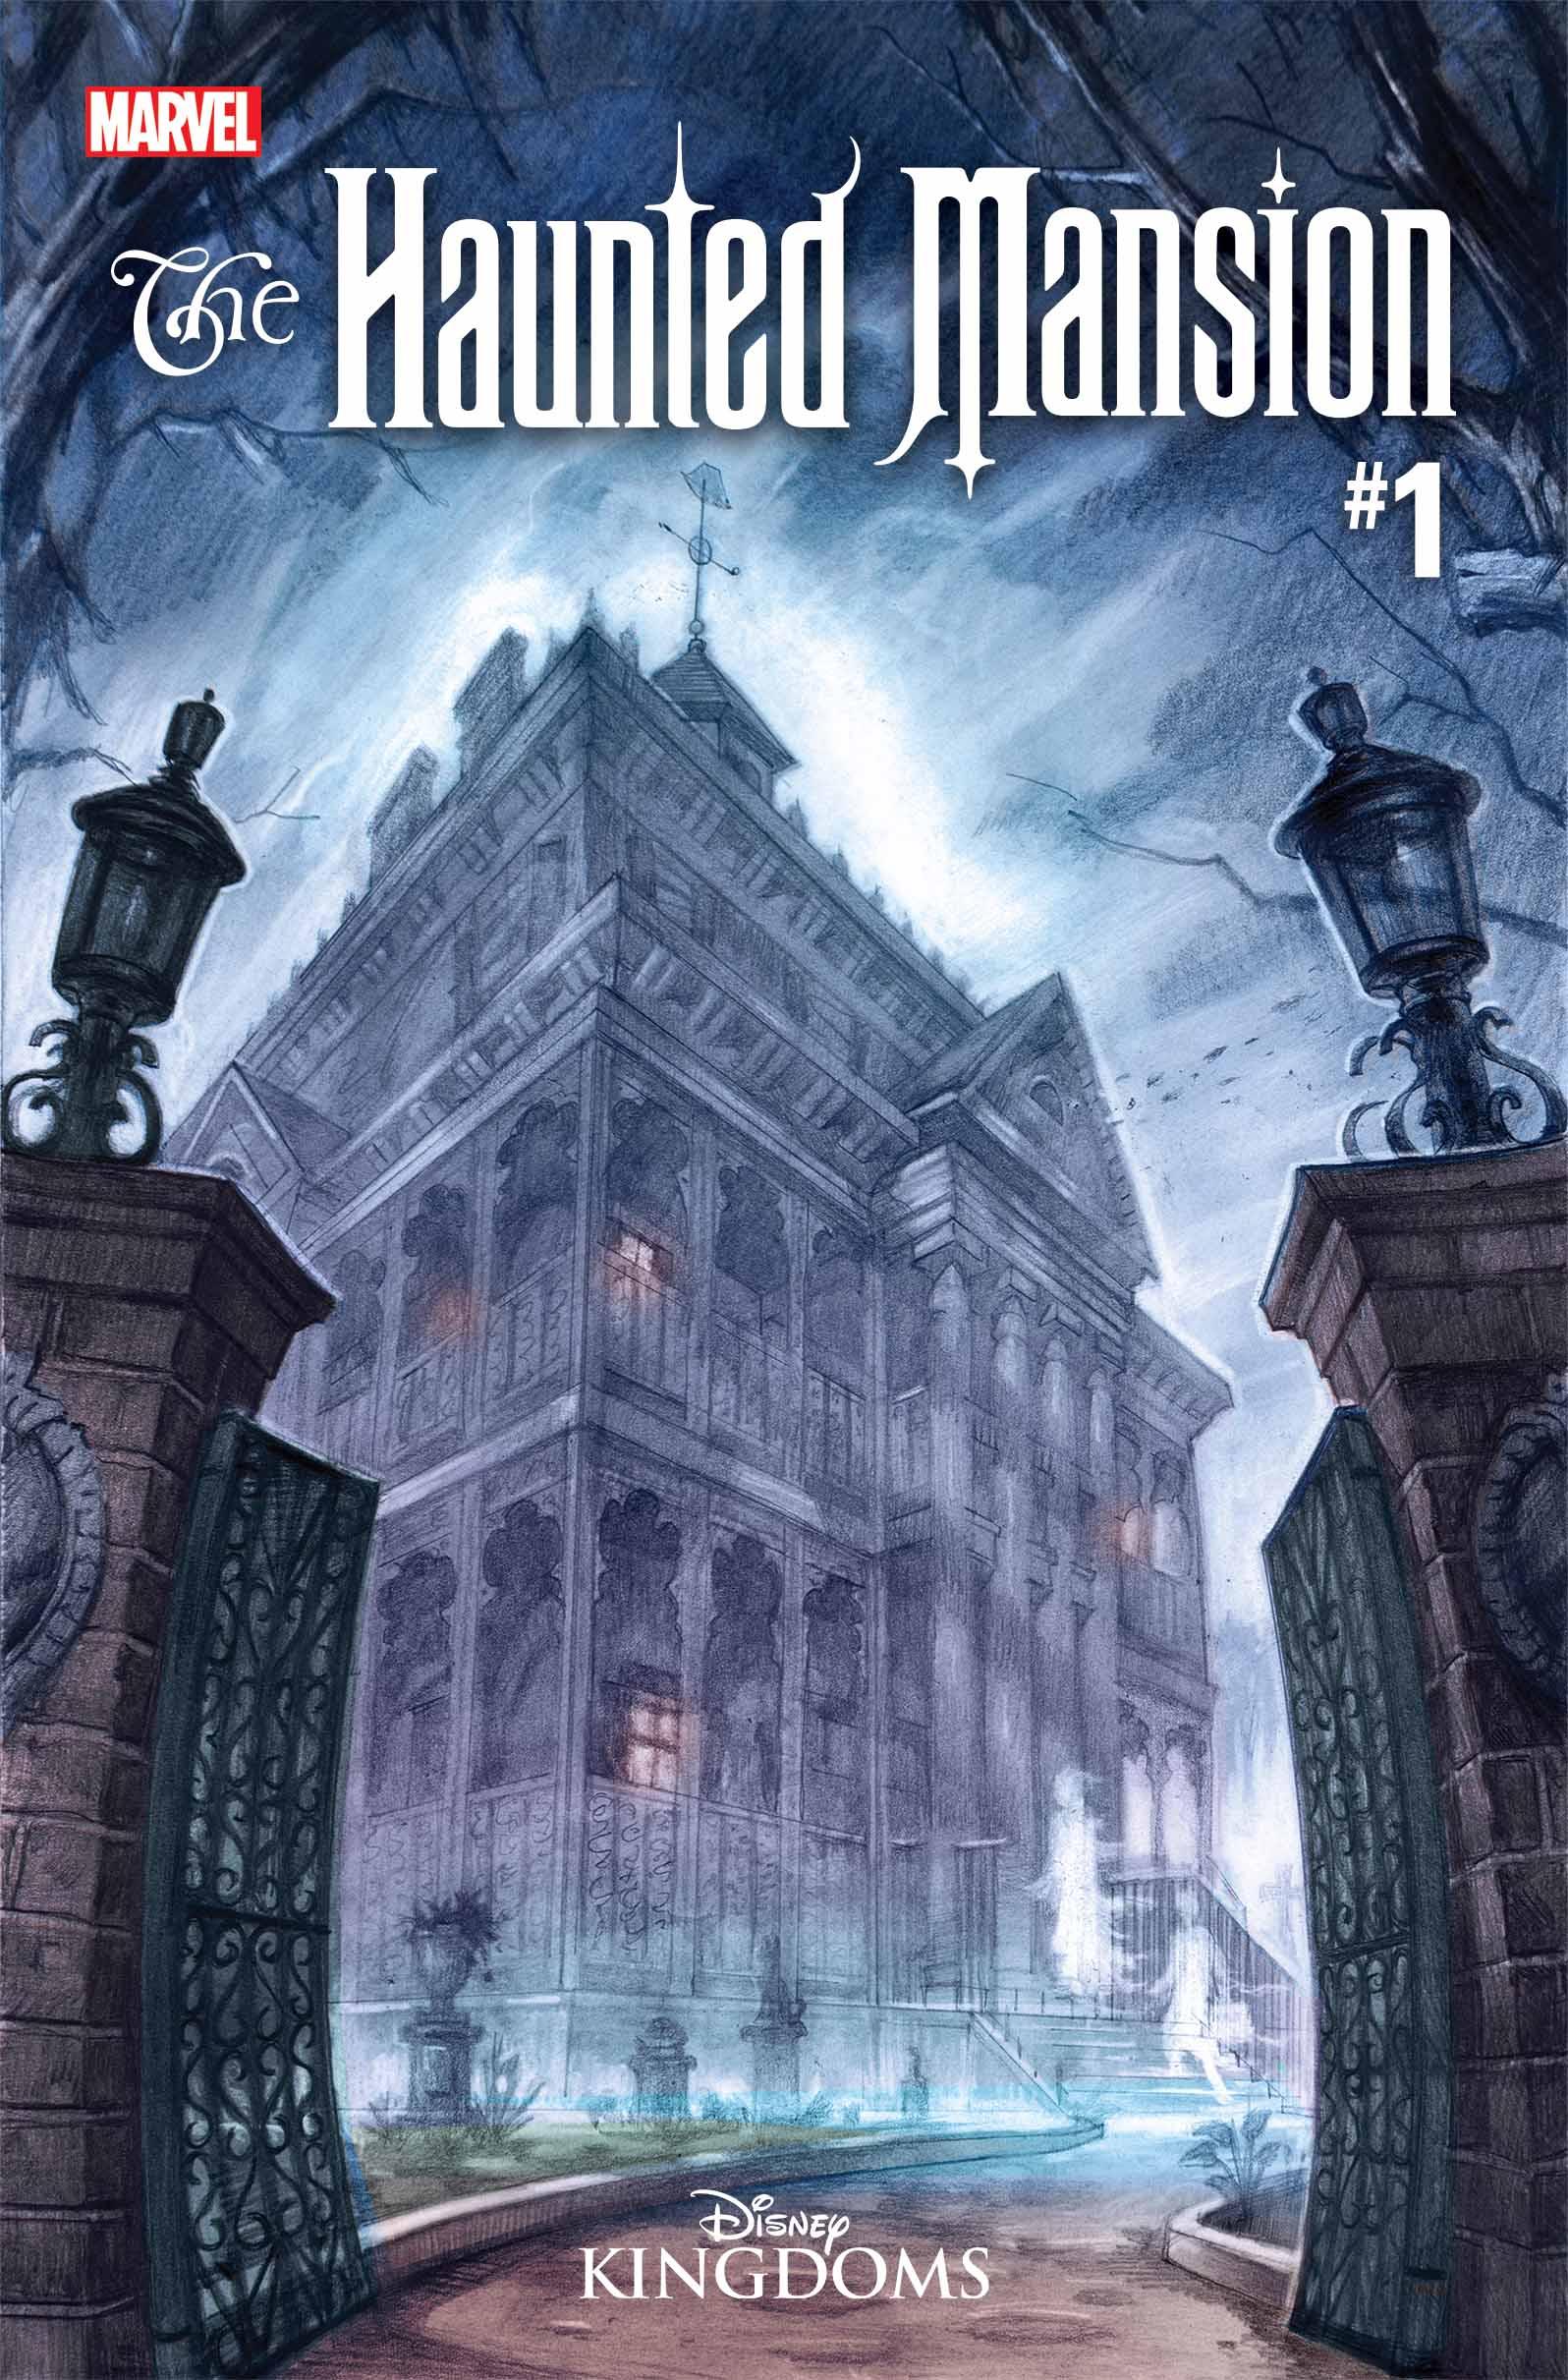 Marvel to Publish Haunted Mansion Comic